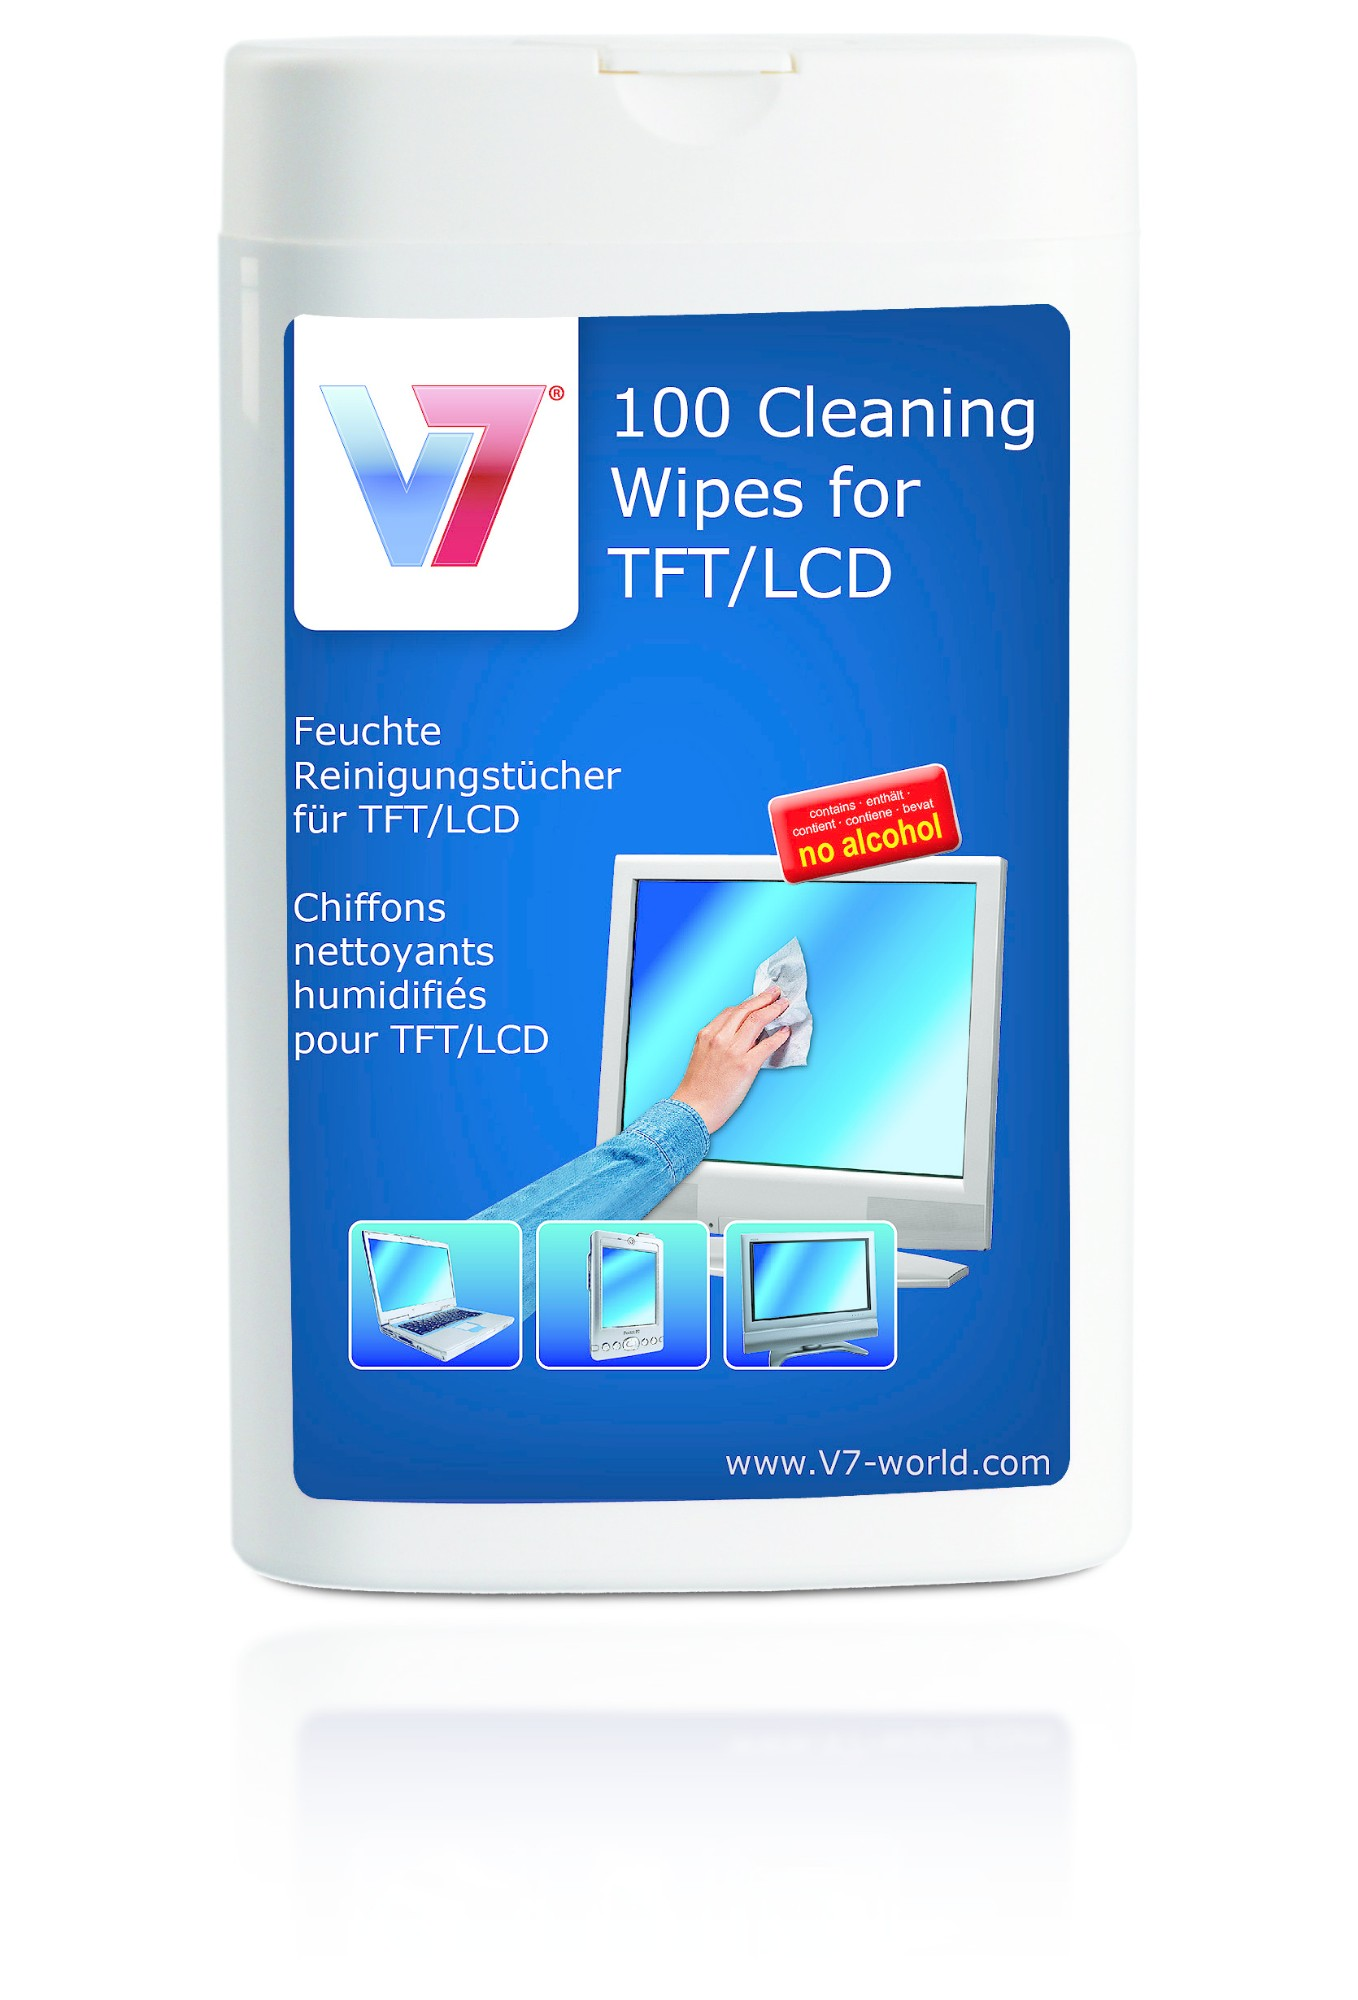 V7 TFT & LCD Toallitas de limpieza